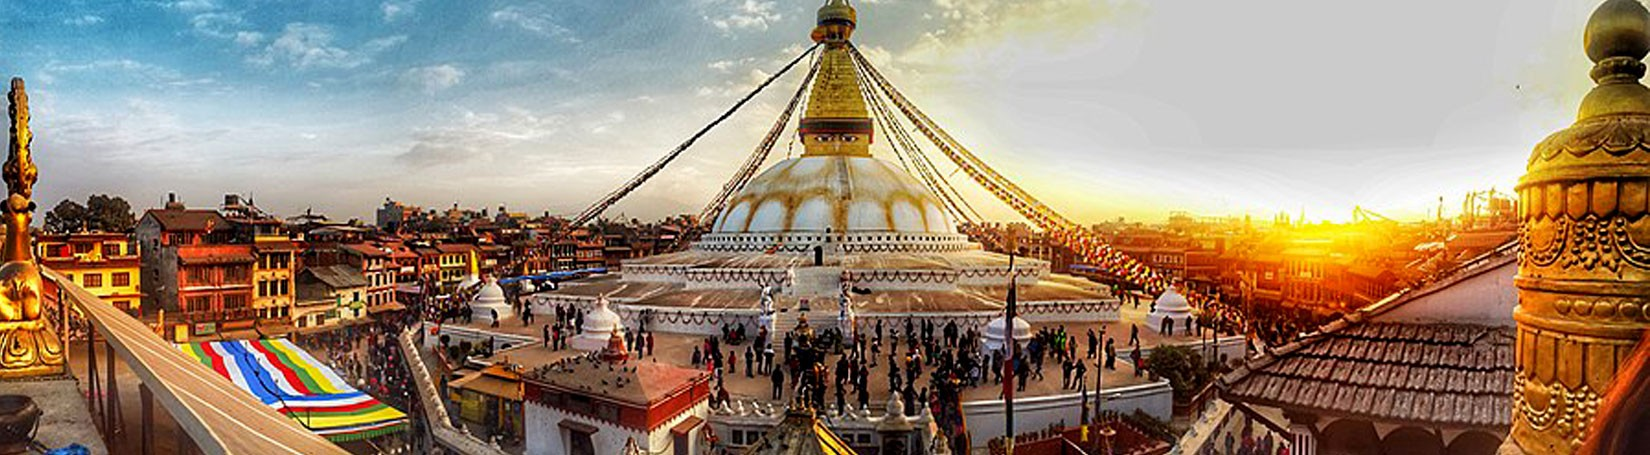 Bouddhanath Stupa in Kathmandu